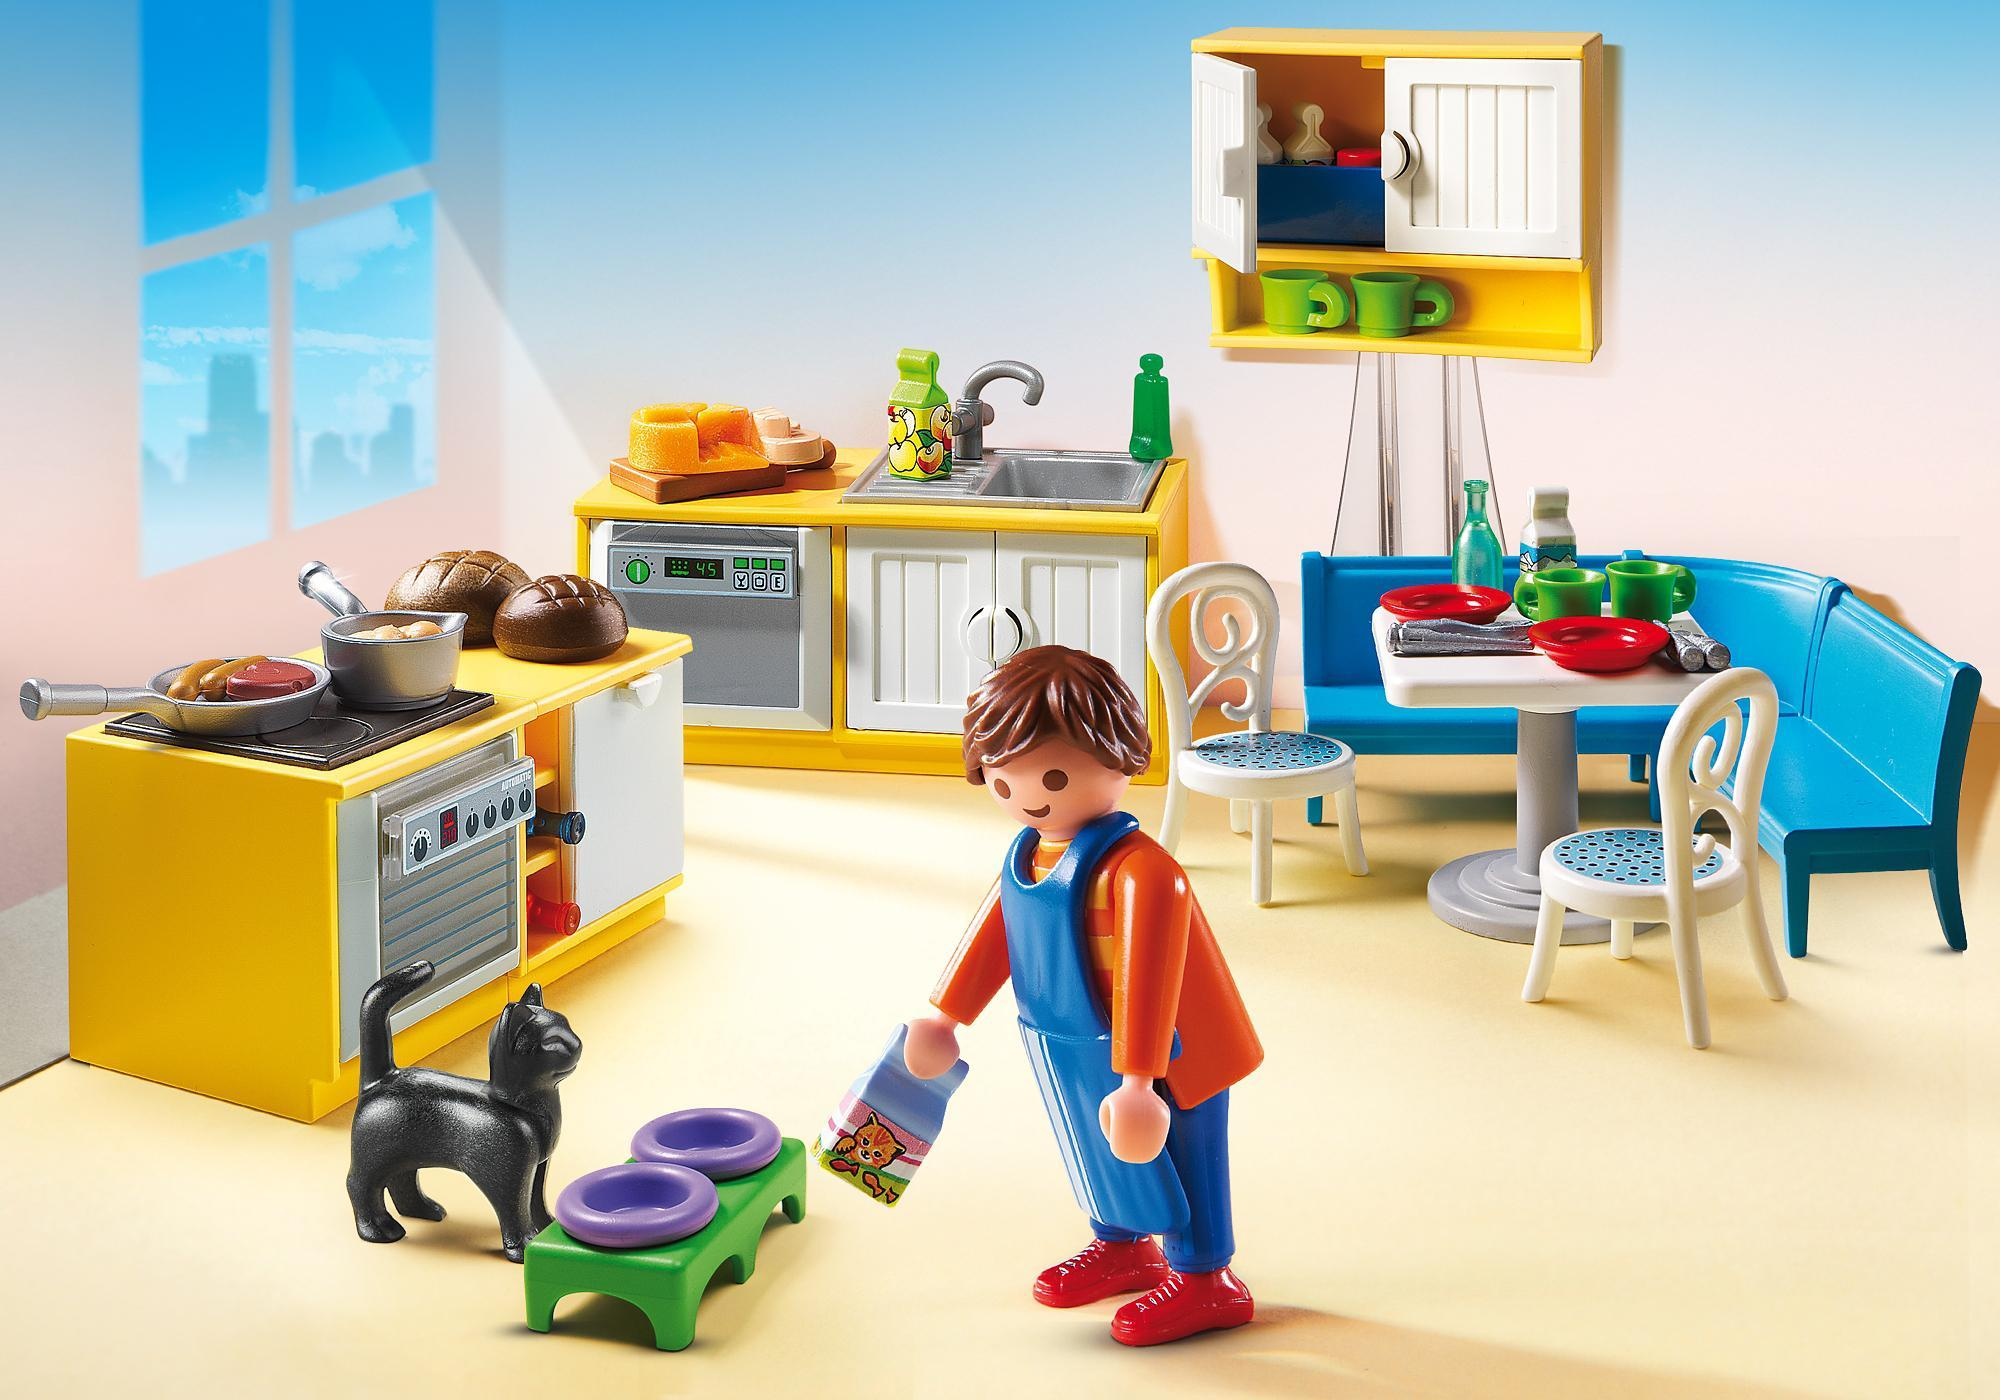 http://media.playmobil.com/i/playmobil/5336_product_detail/Einbauküche mit Sitzecke